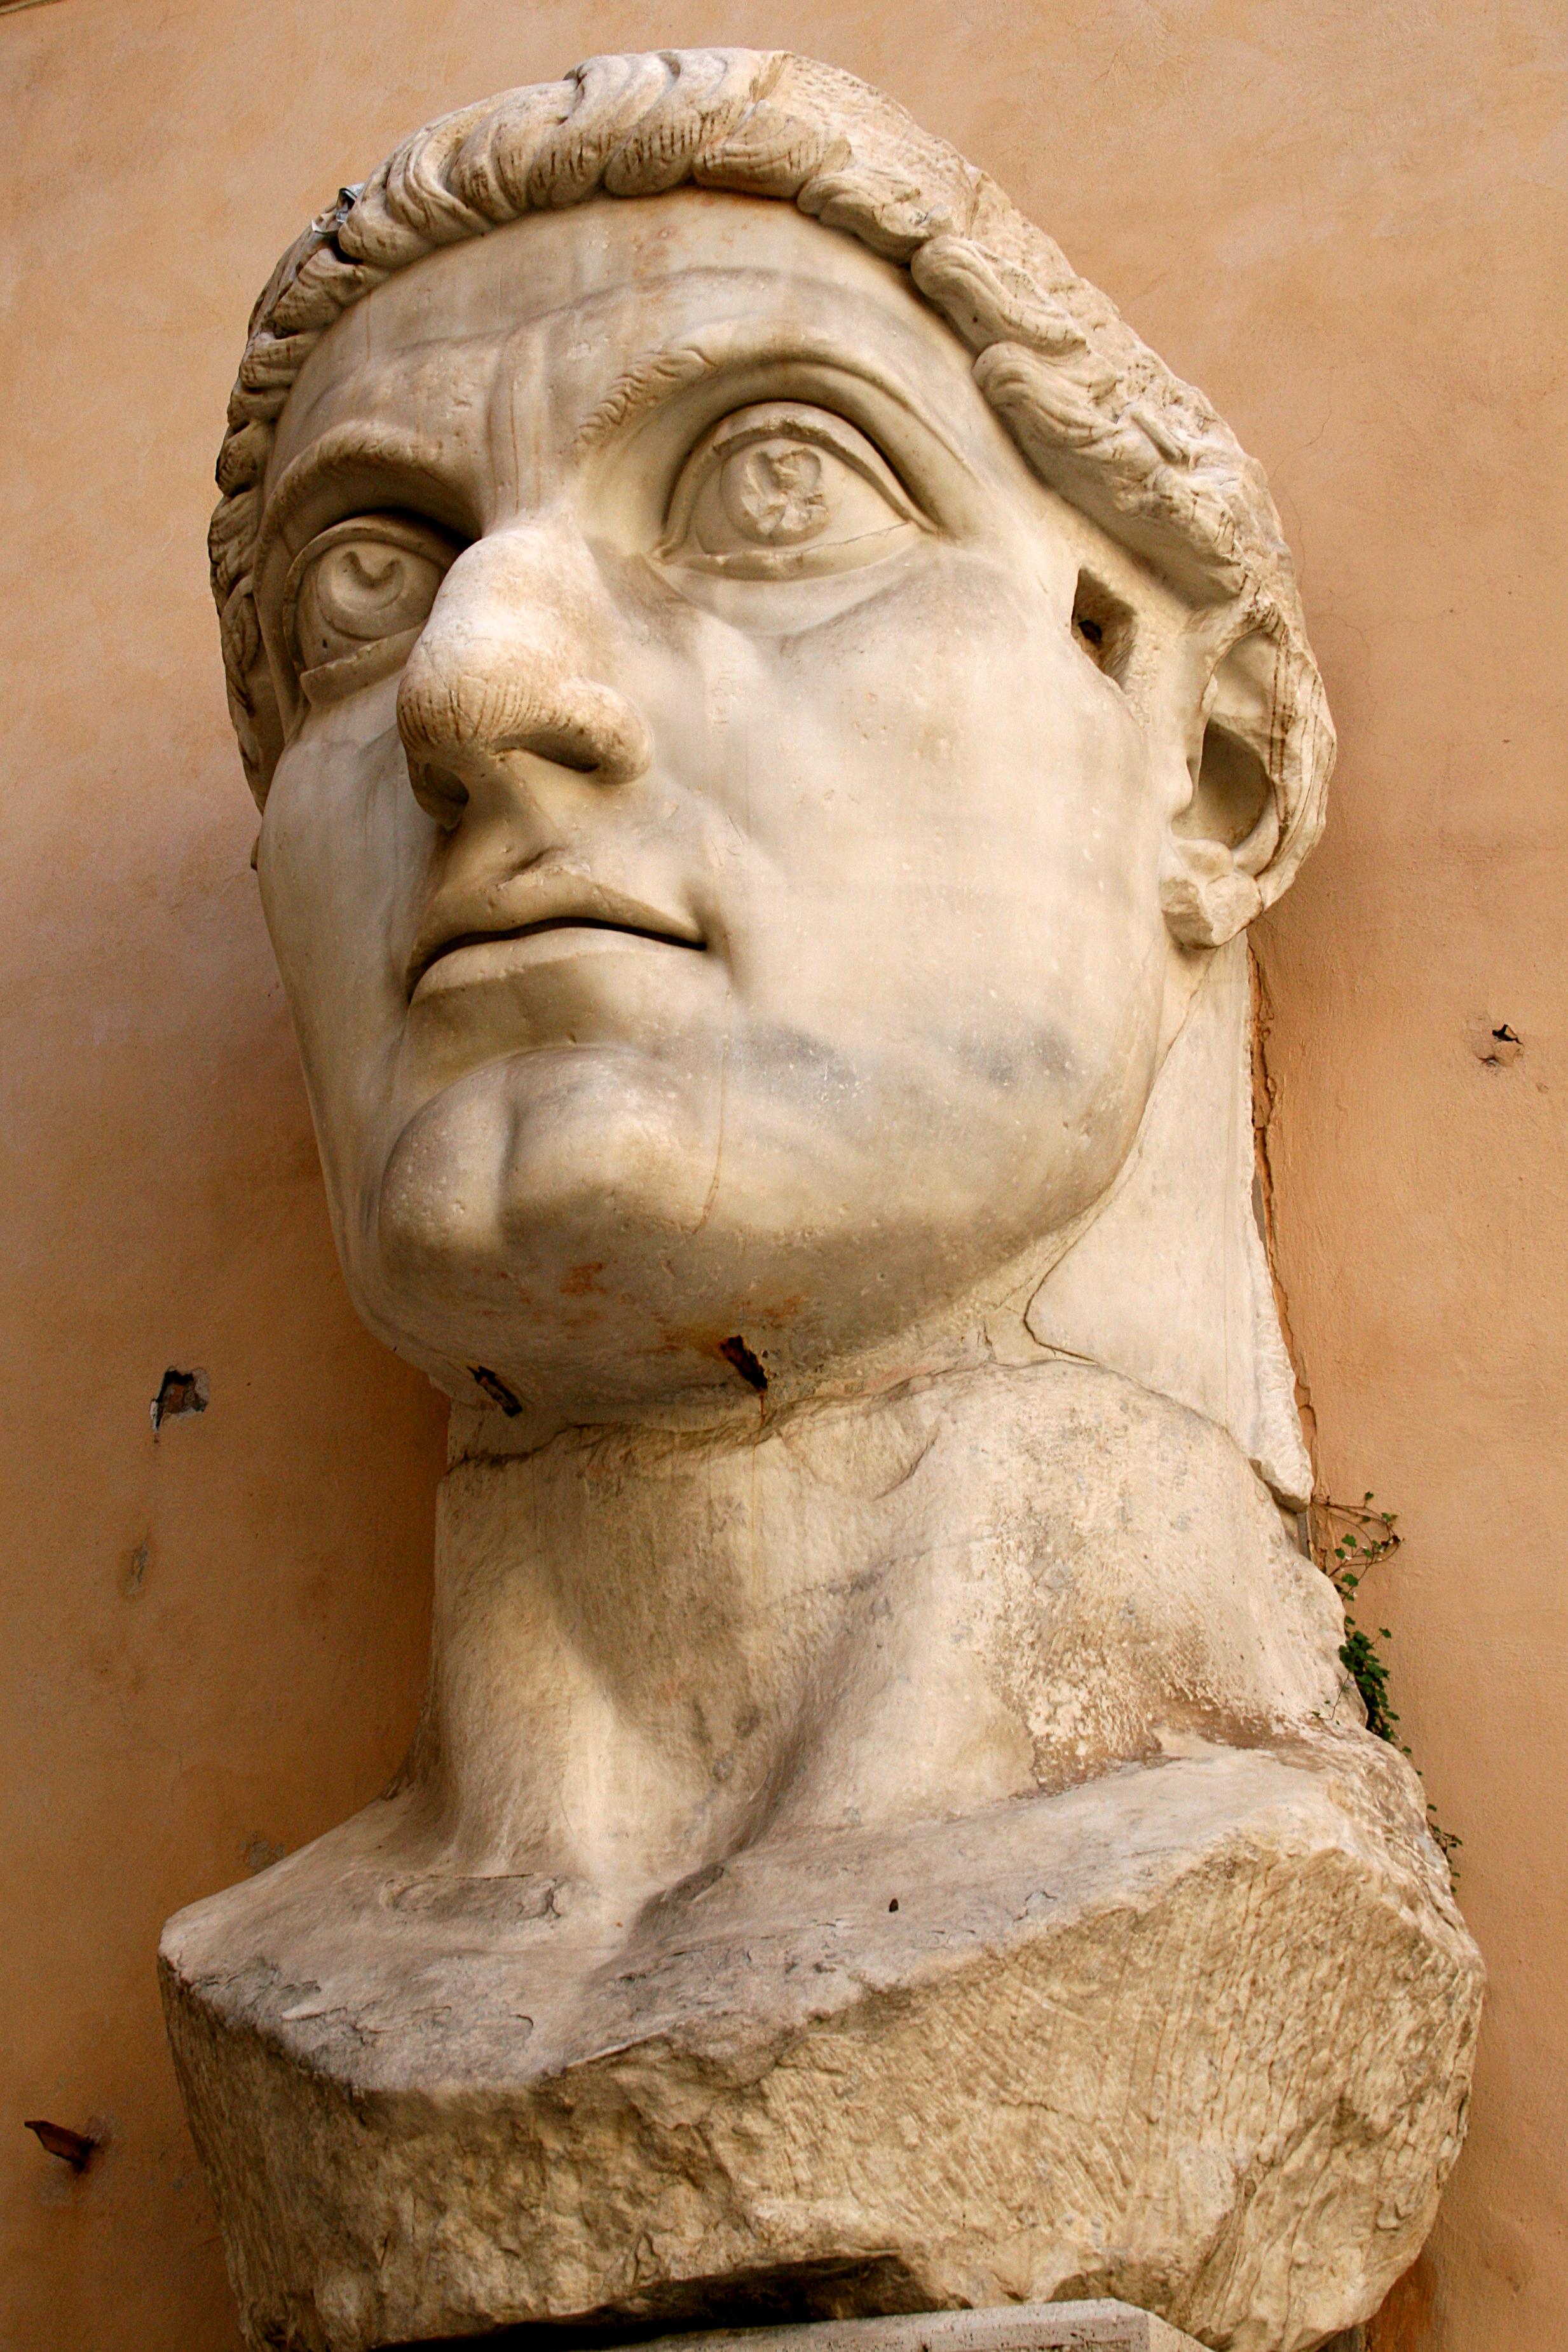 http://upload.wikimedia.org/wikipedia/commons/2/20/0_Constantinus_I_-_Palazzo_dei_Conservatori_%282%29.JPG